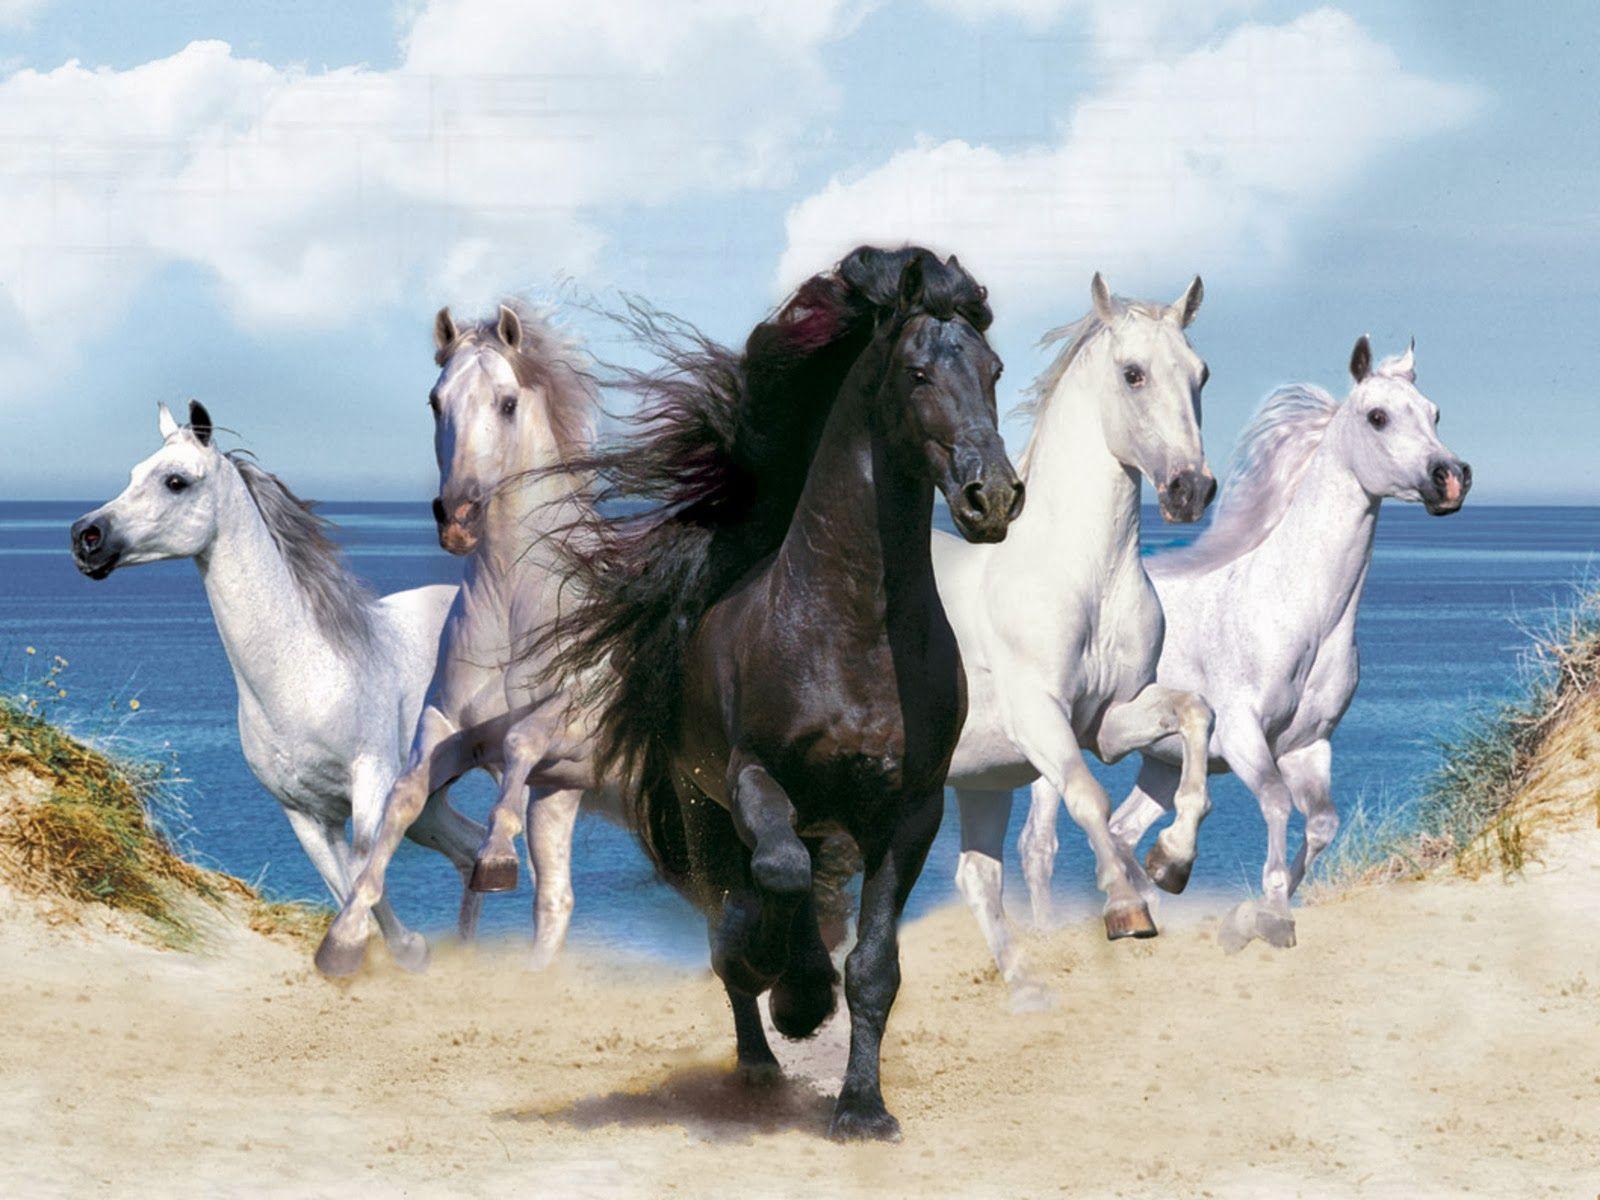 Must see Wallpaper Horse Pinterest - 133db1c801d3342dd998981e43f5b646  2018_883946.jpg